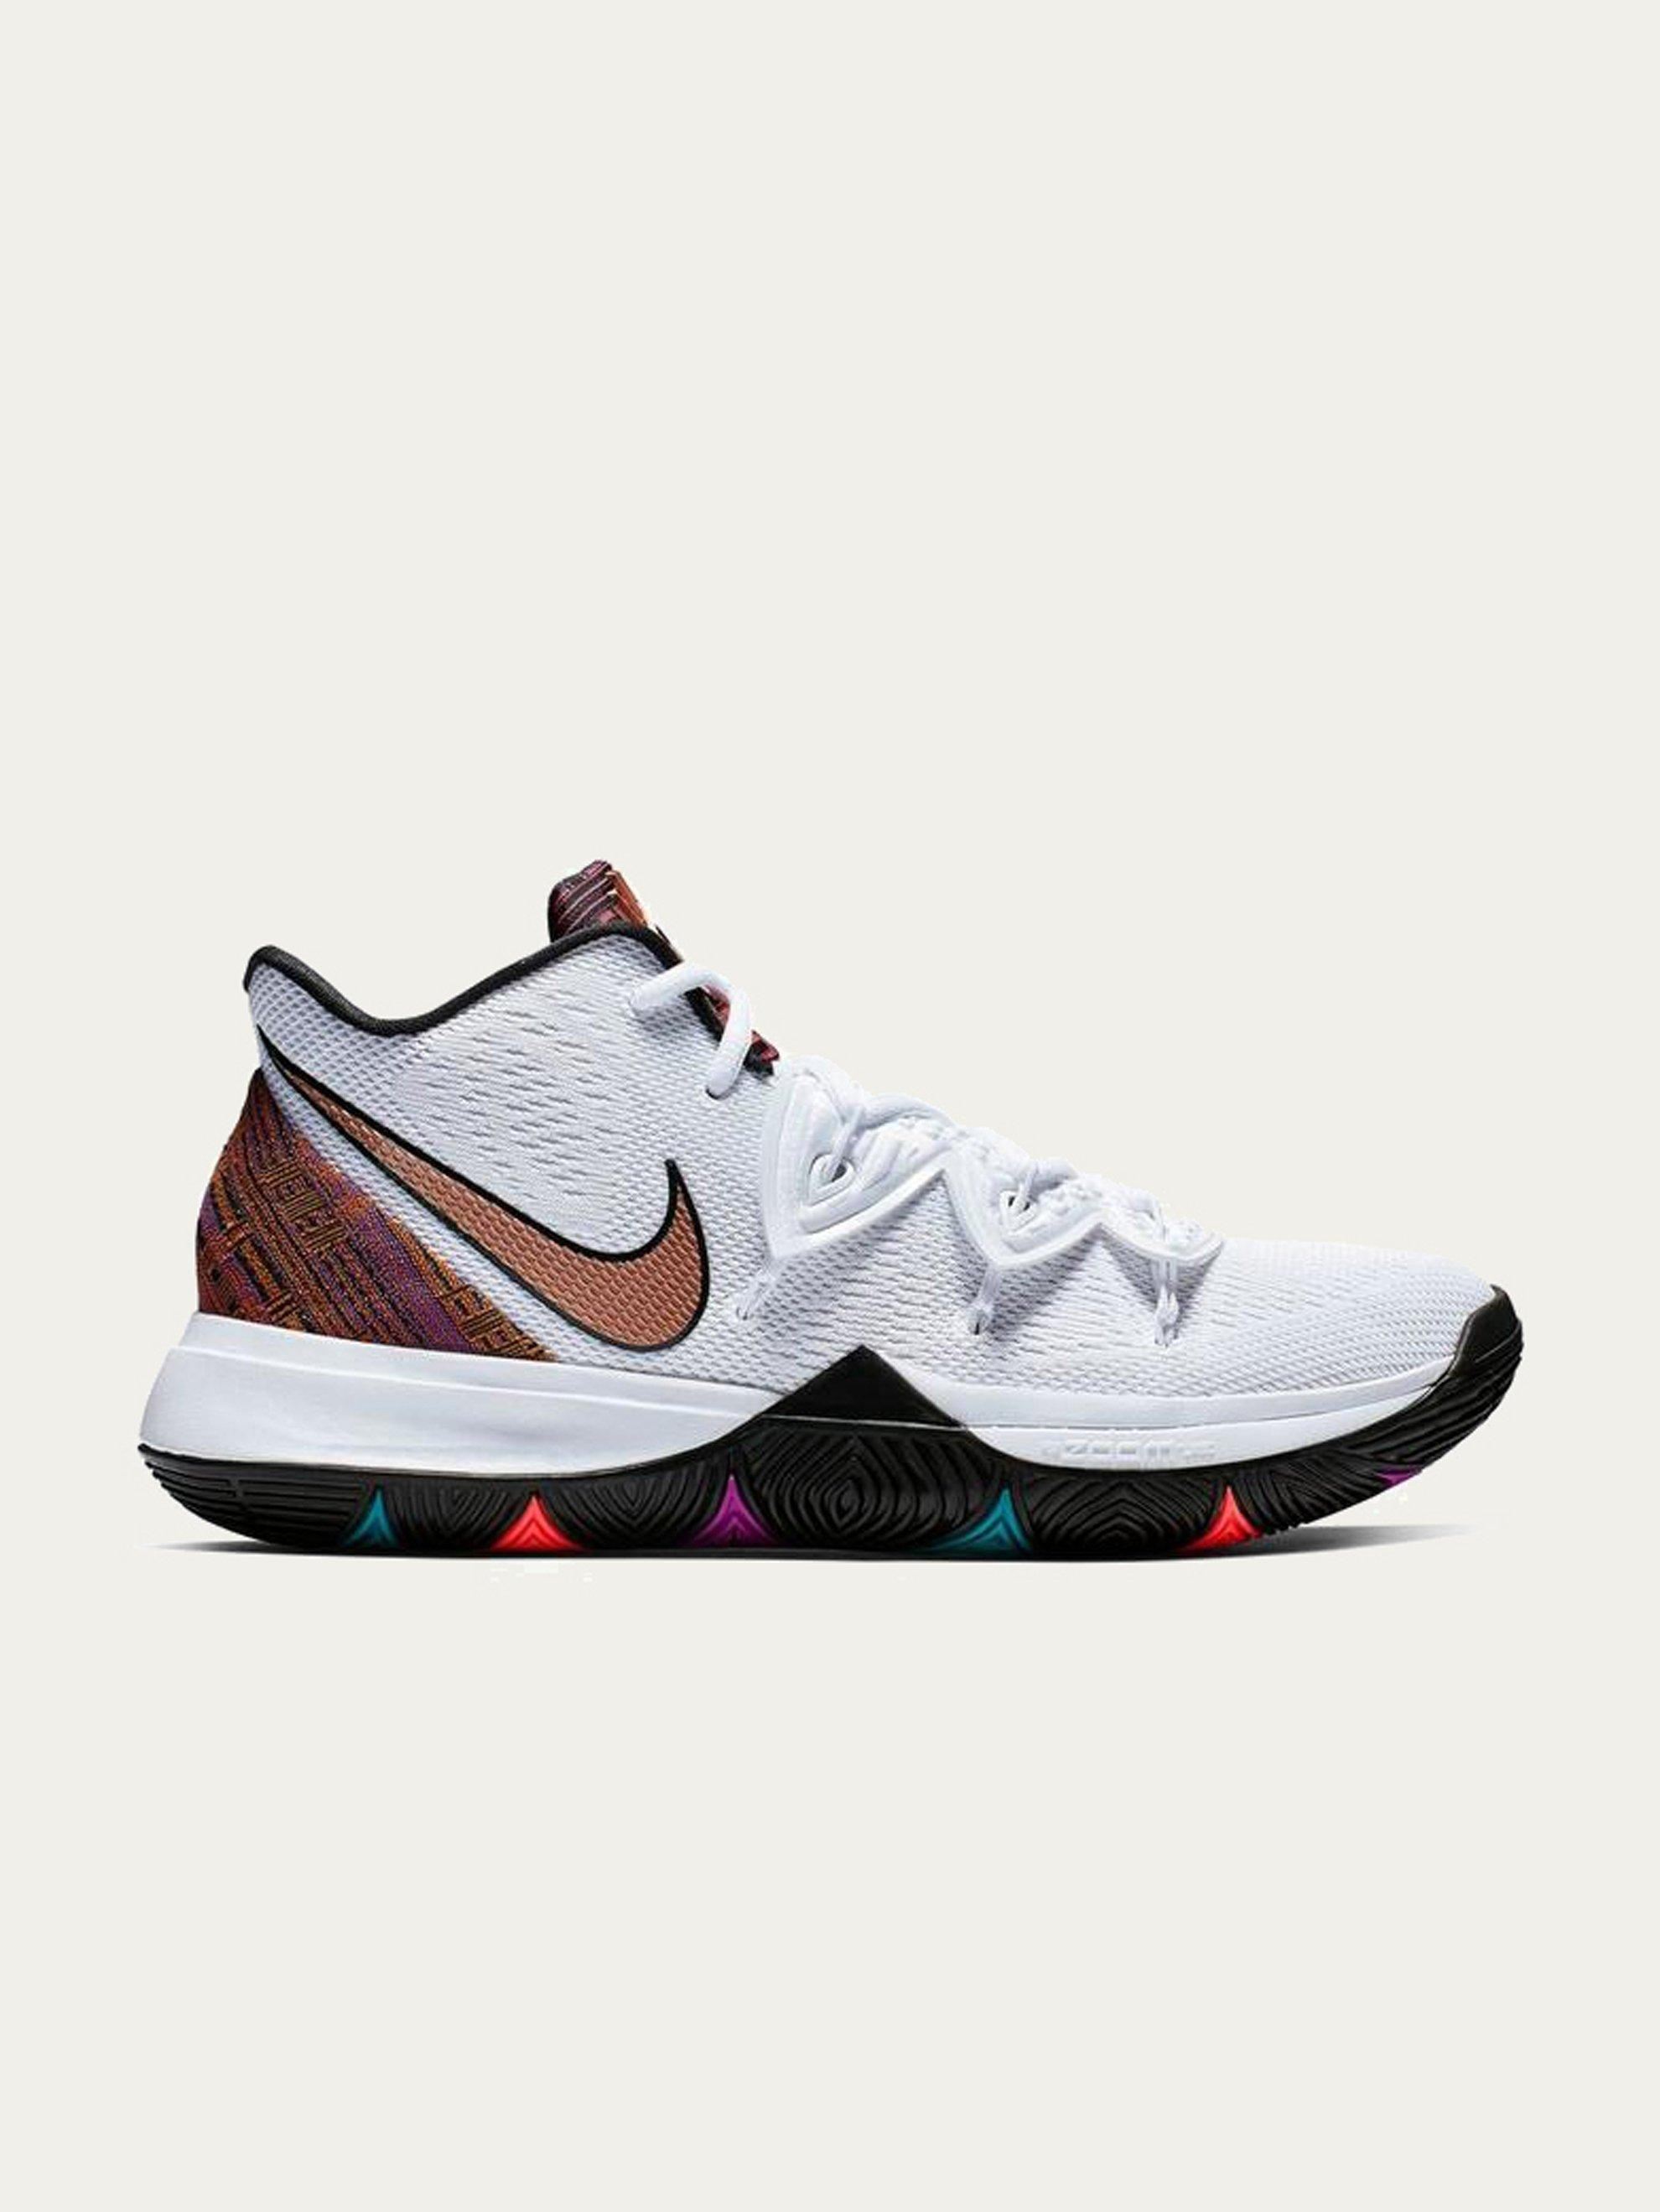 8c43c750ec96 Nike Kyrie 5 Bhm in White for Men - Lyst